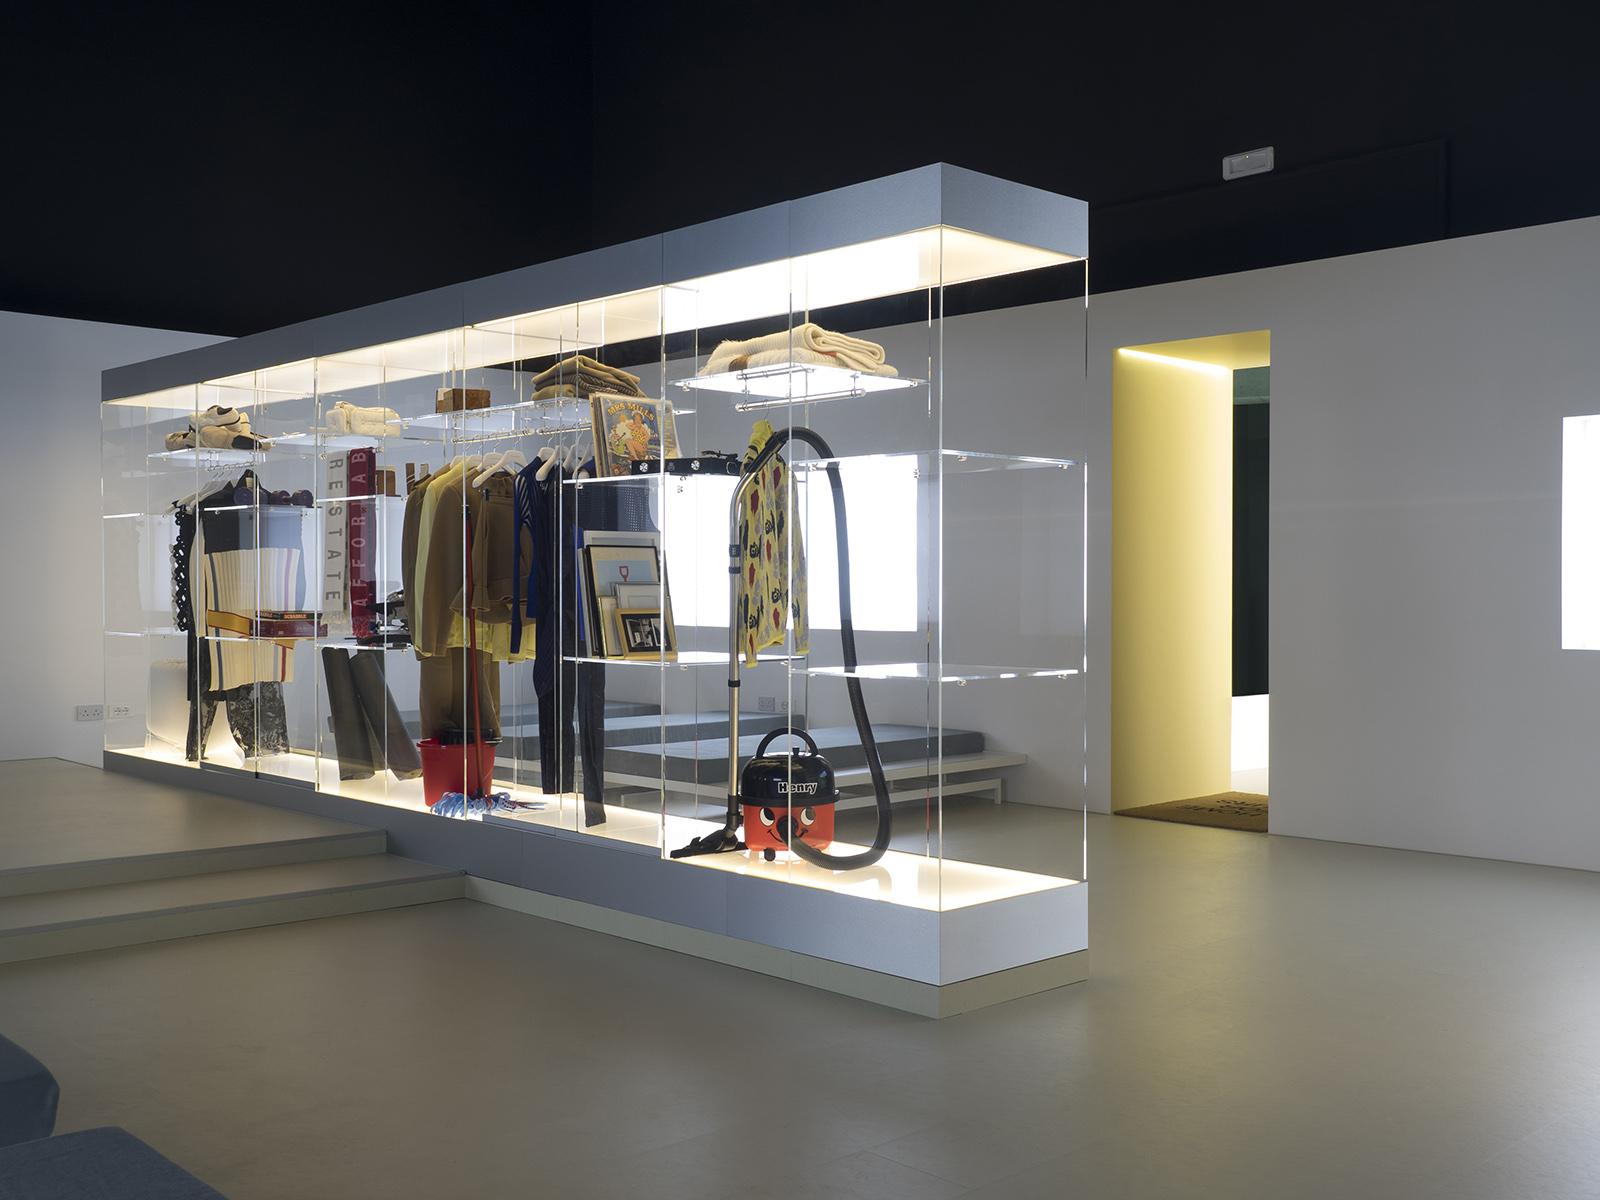 'Hours' room, <em>Home Economics</em> at the British Pavilion, Venice Architecture Biennale 2016 Photography: Cristiano Corte, courtesy British Council